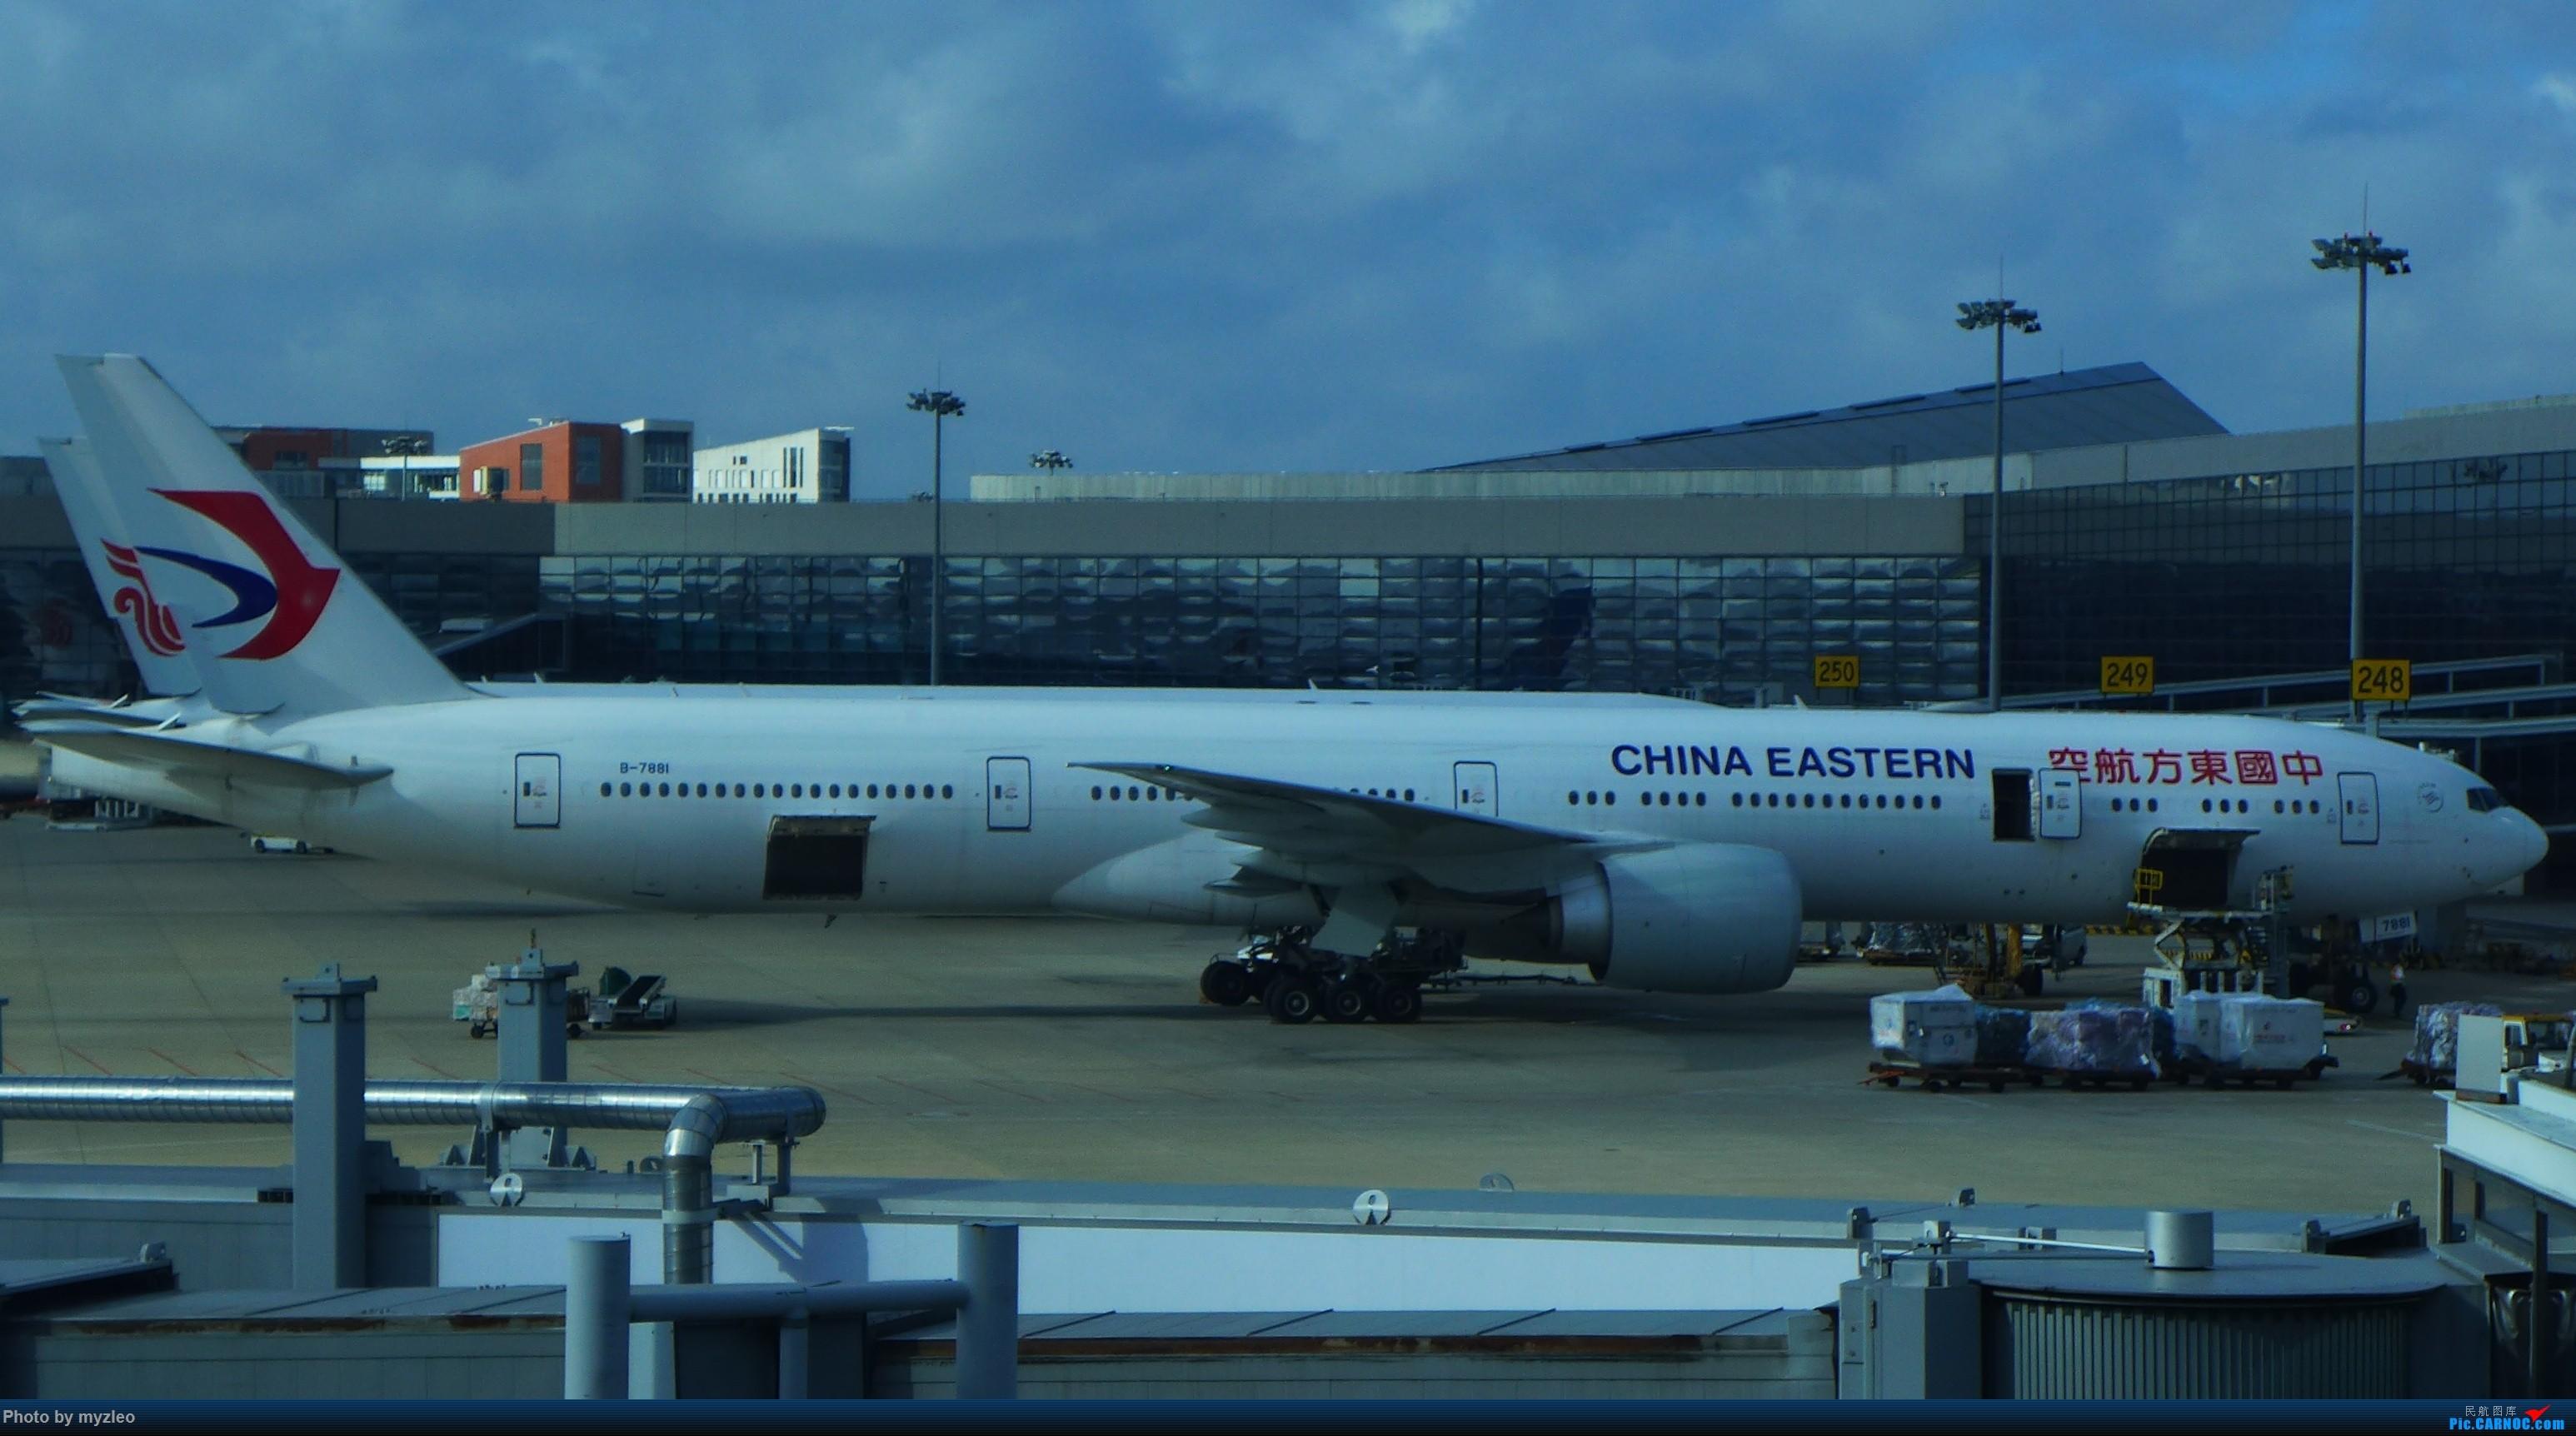 Re:[原创]【myzleo的游记2.1】昆洱风光(1)——SHA-KMG上航商务舱再体验+人在昆明 BOEING 777-300ER B-7881 中国上海虹桥国际机场